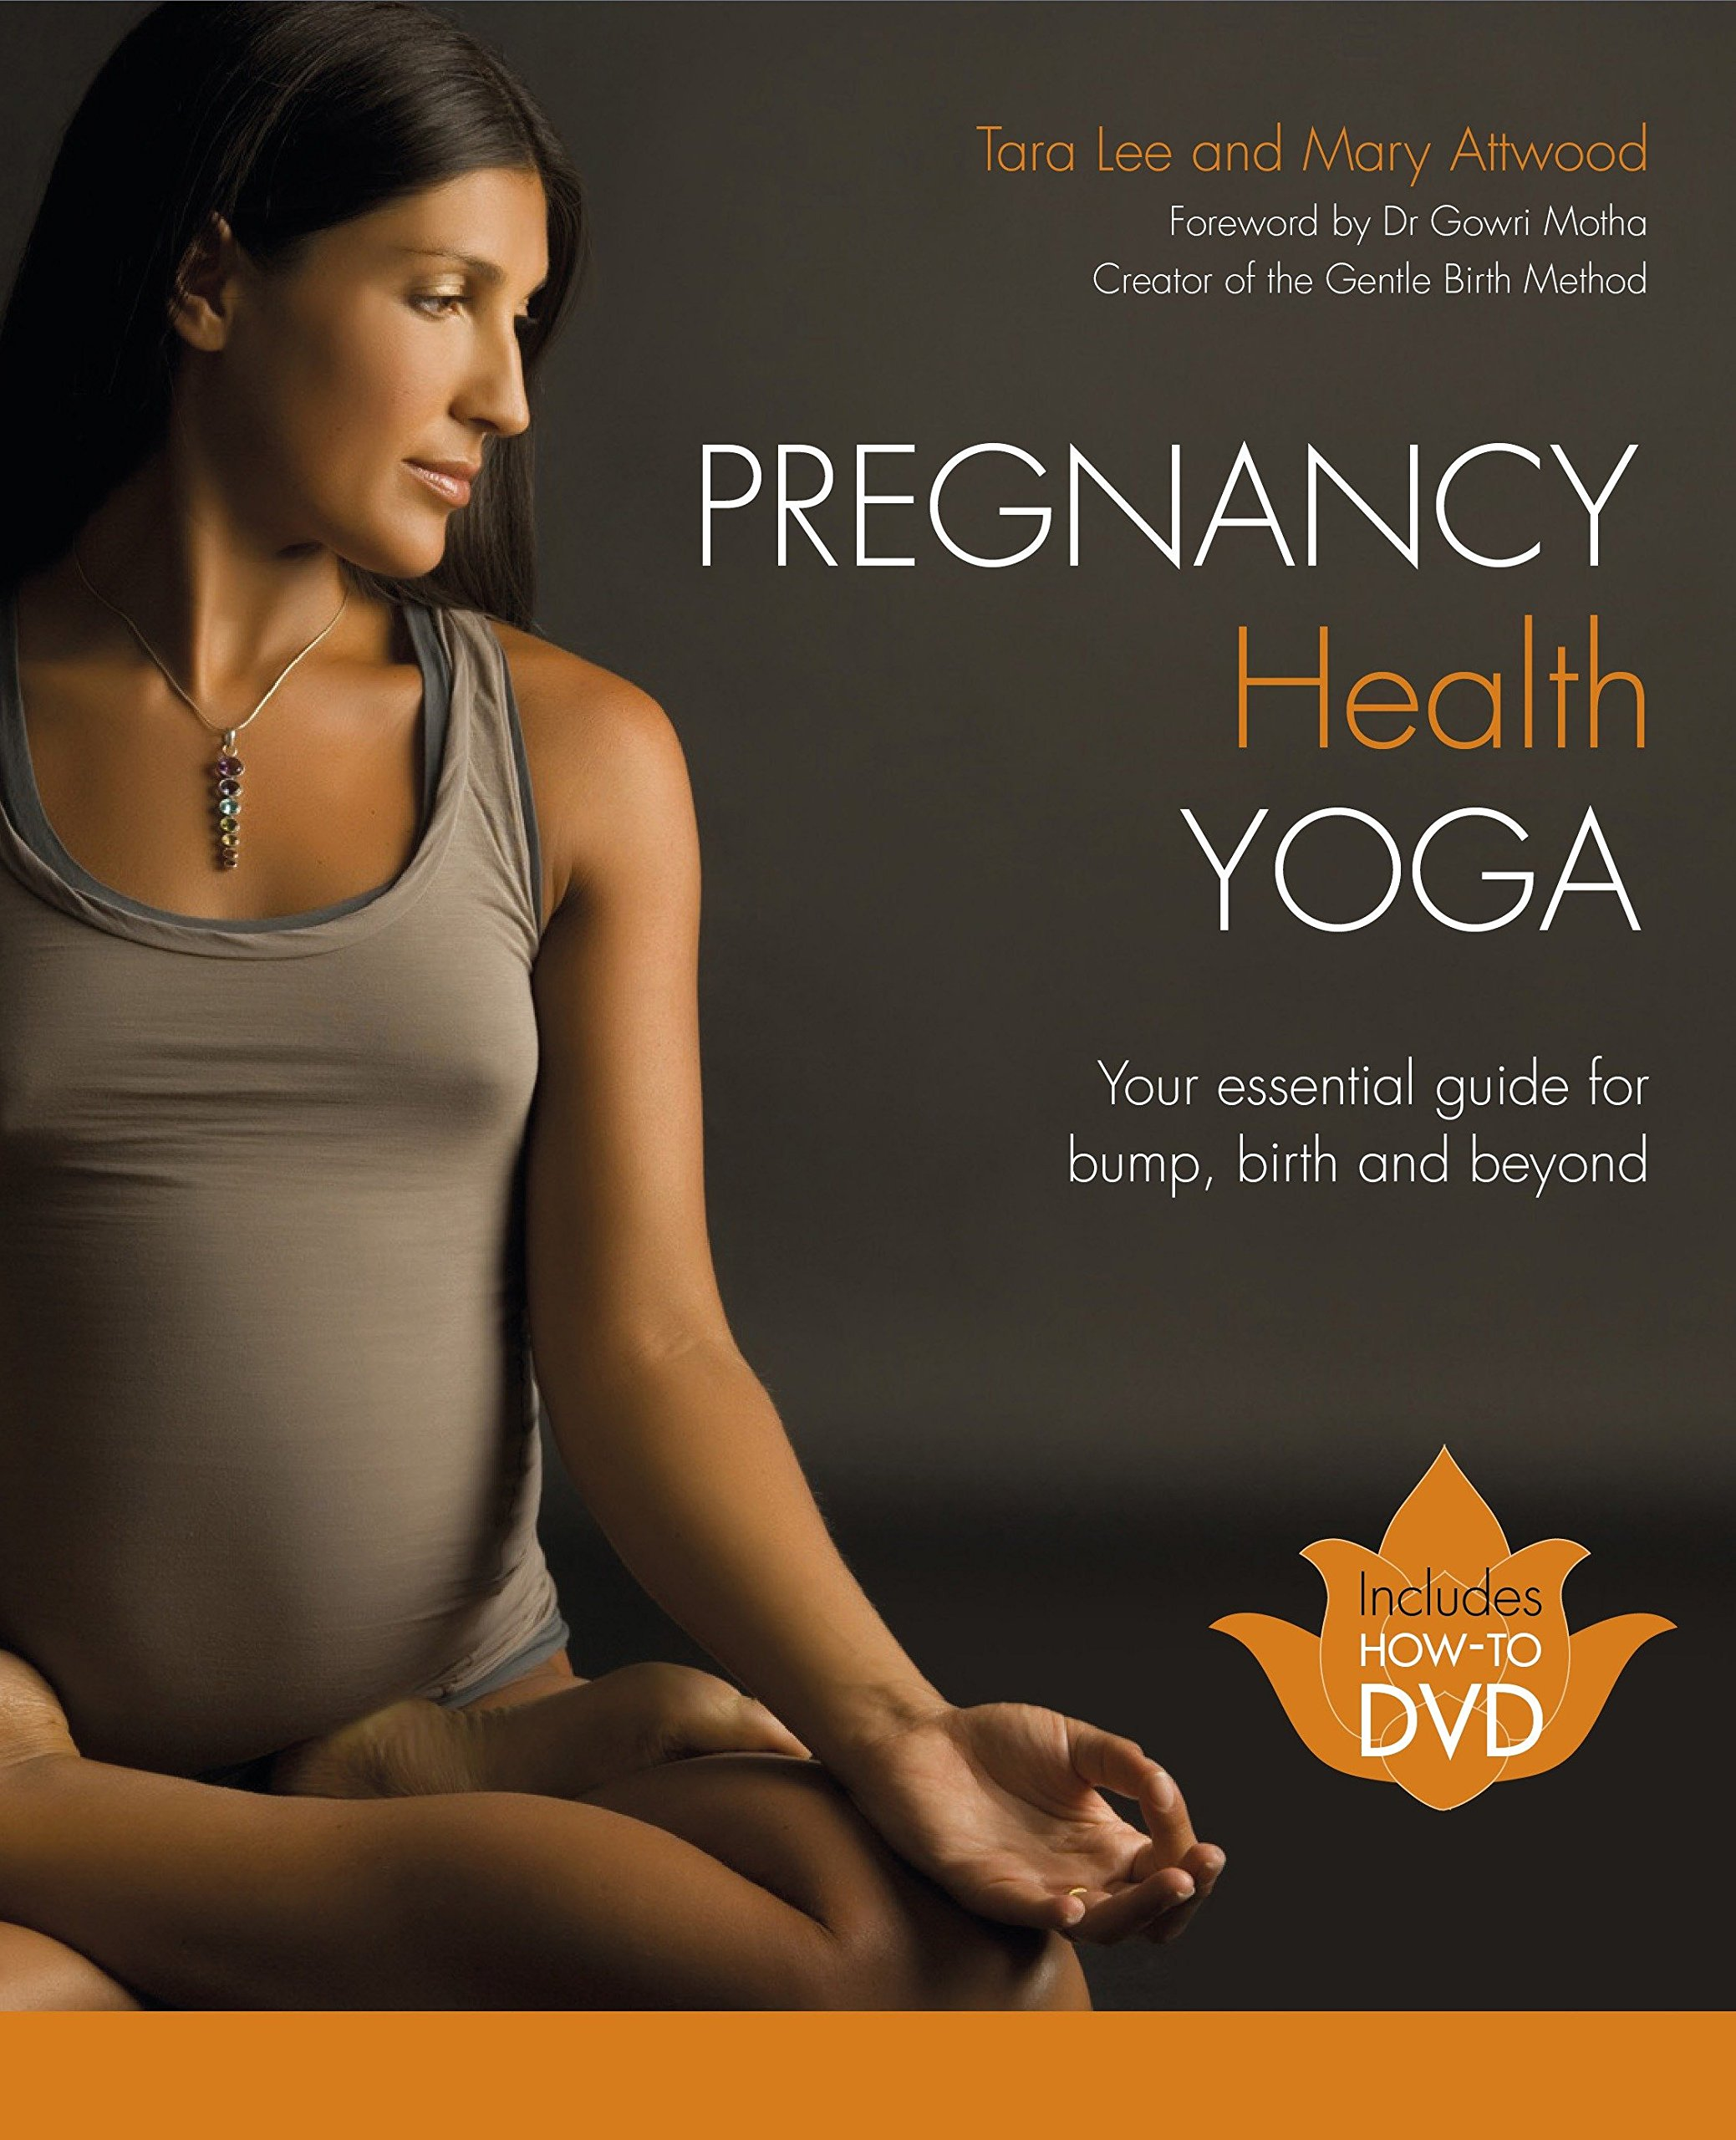 Pregnancy Health Yoga: Your Essential Guide for Bump, Birth and Beyond pdf epub